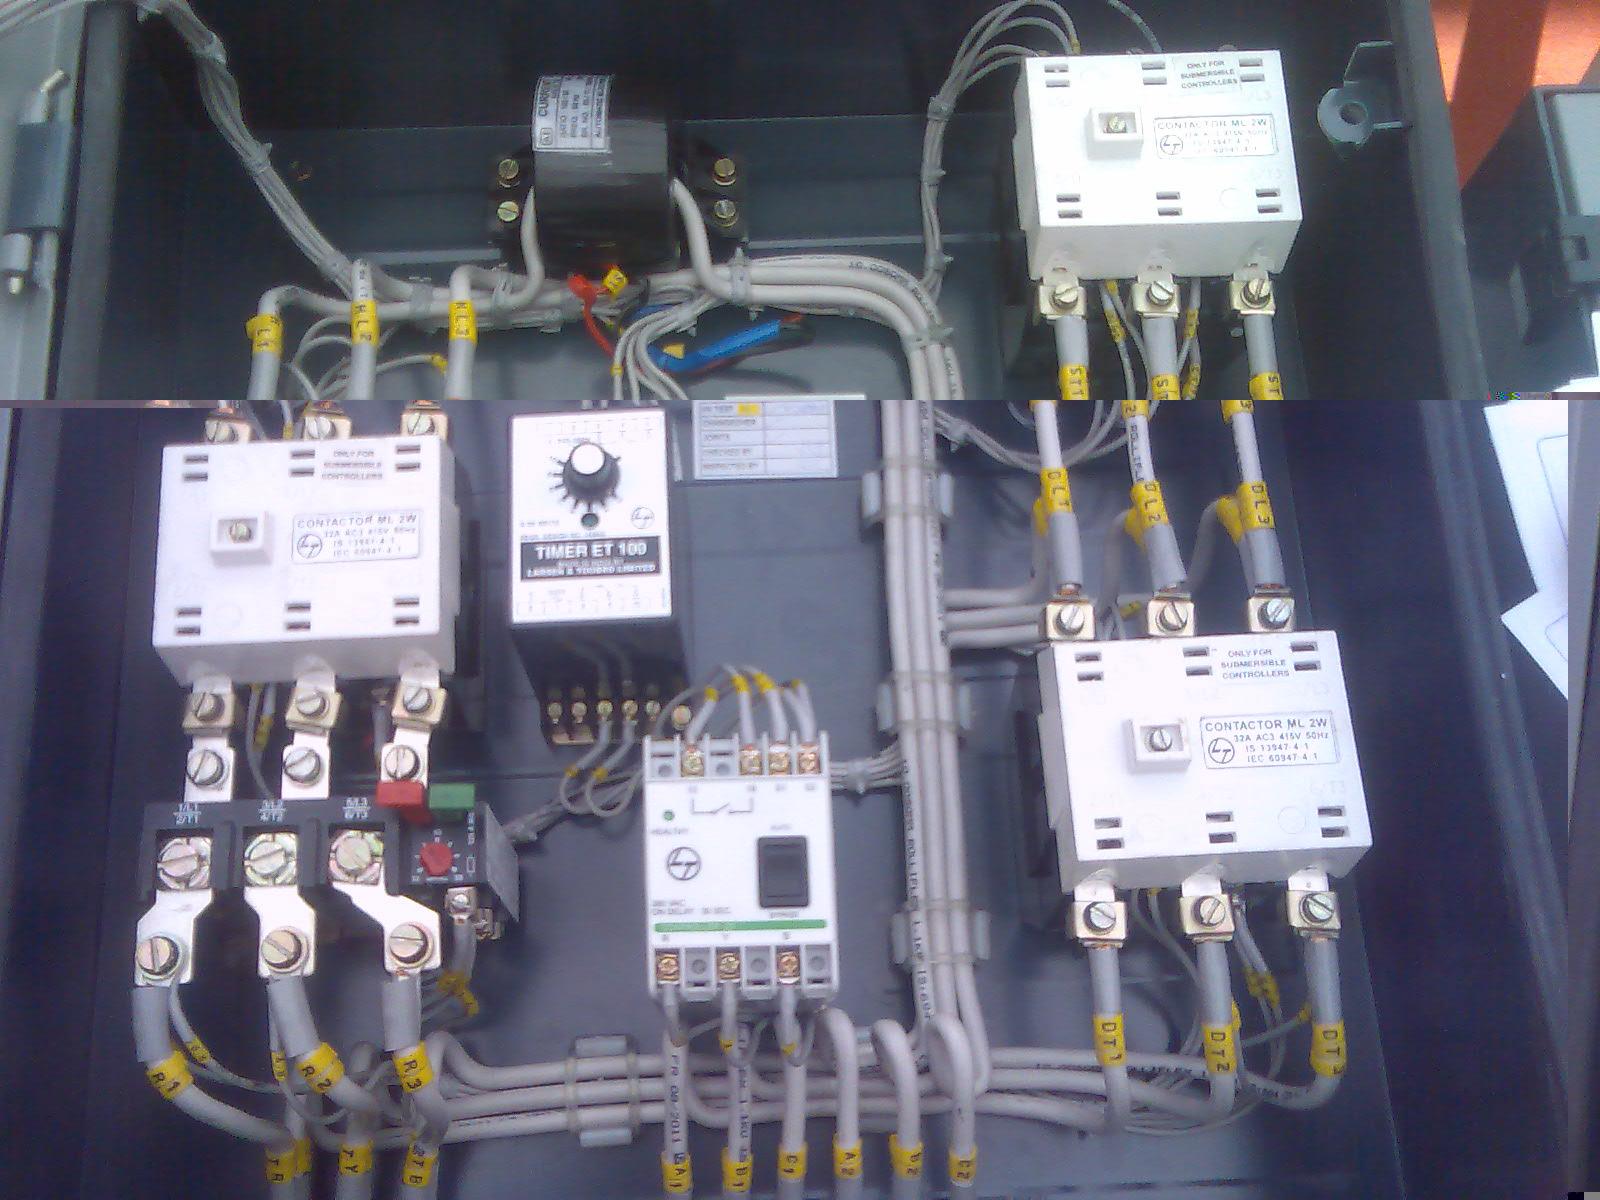 Dol Panel Diagram   Wiring Library - Square D Motor Starter Wiring Diagram